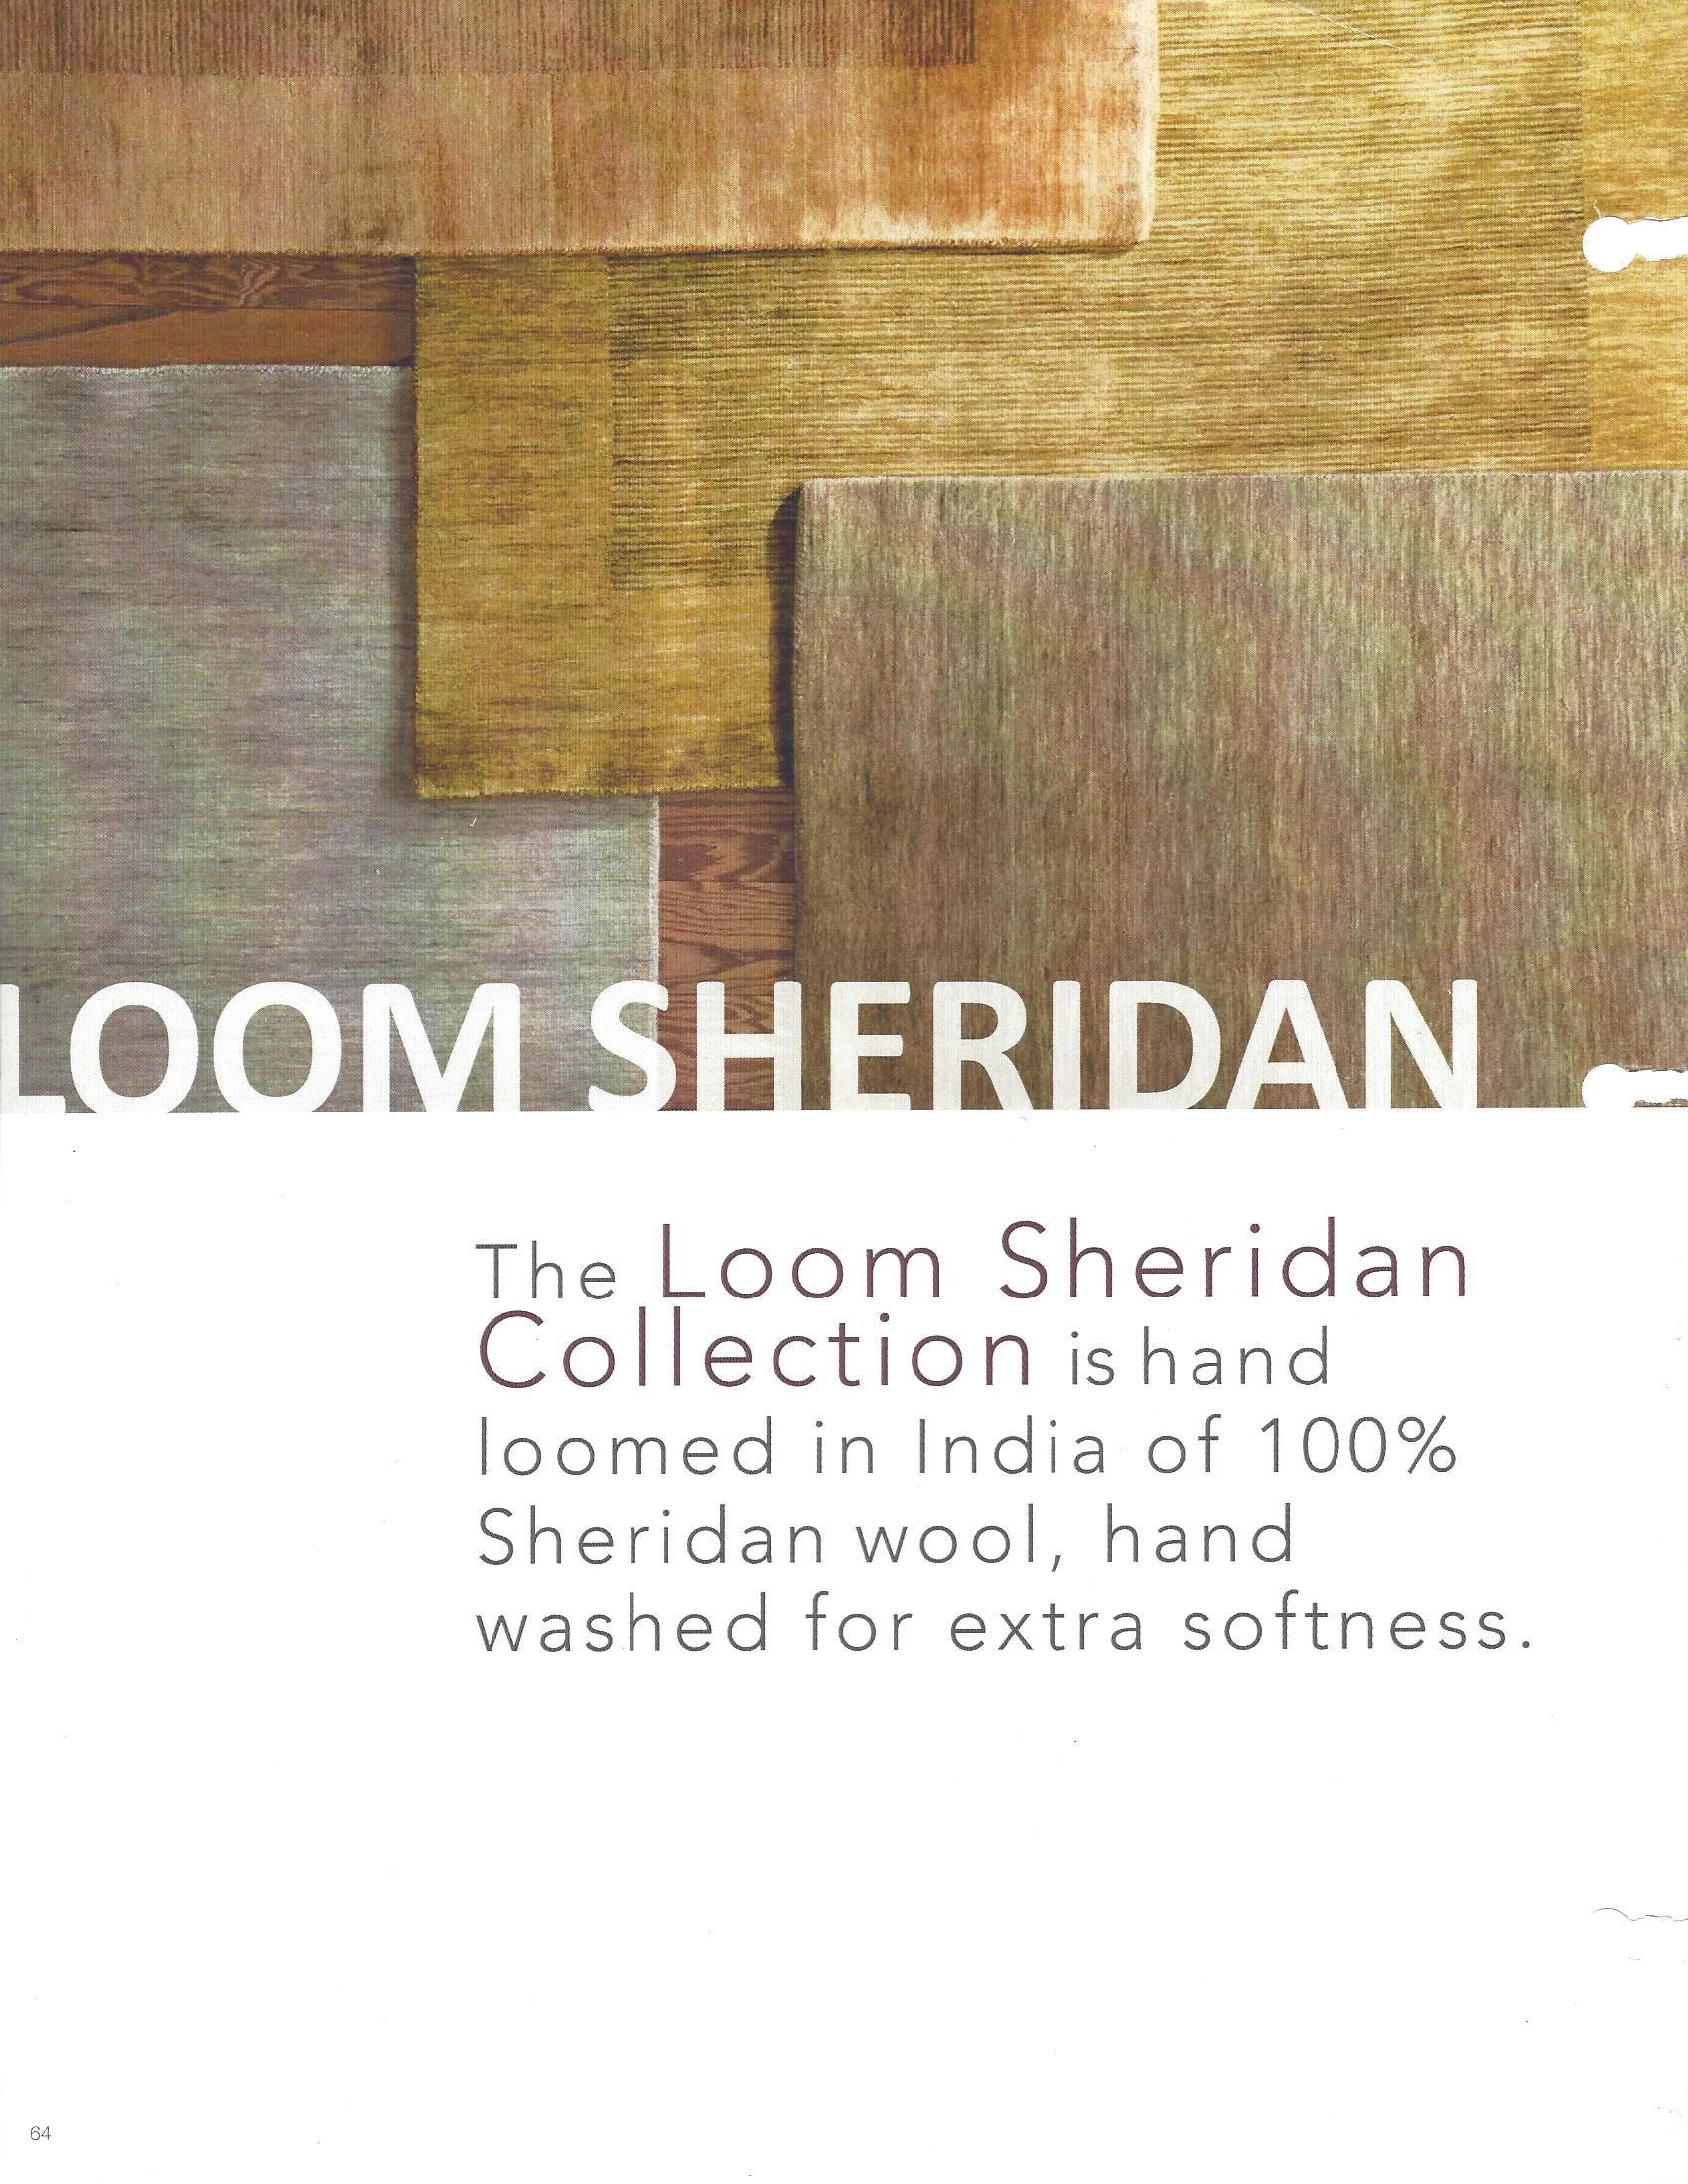 Loom Sheridan